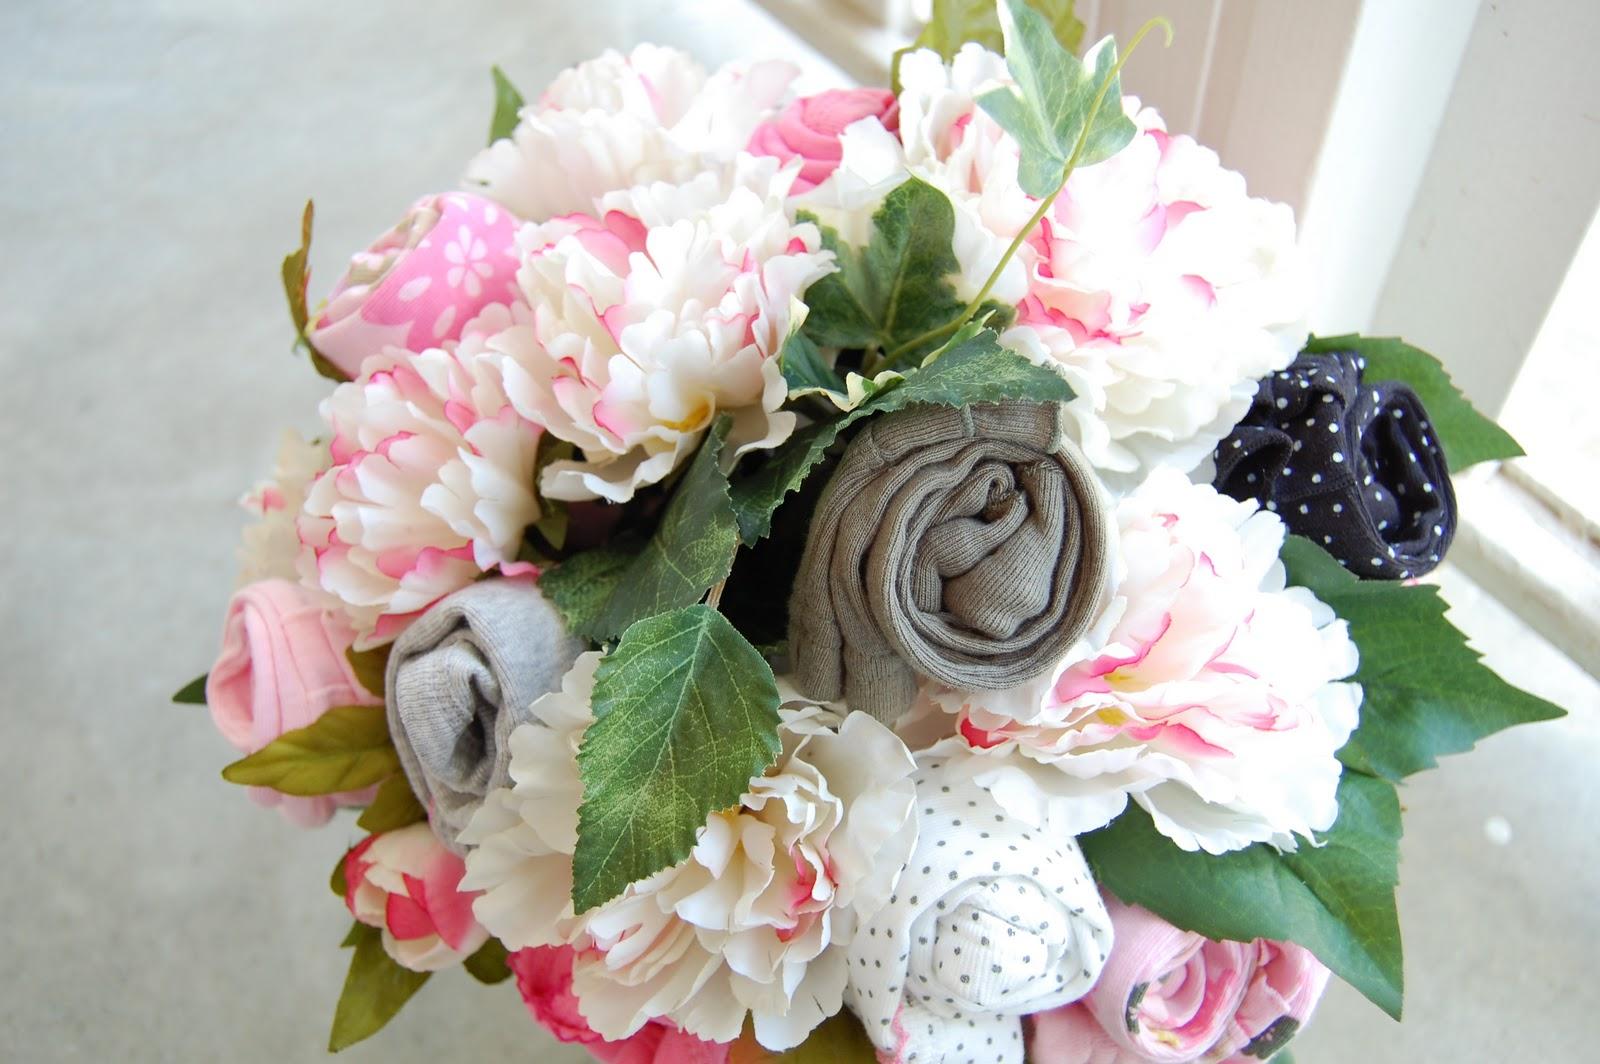 Prettysweet baby shower onesie bouquets izmirmasajfo Choice Image